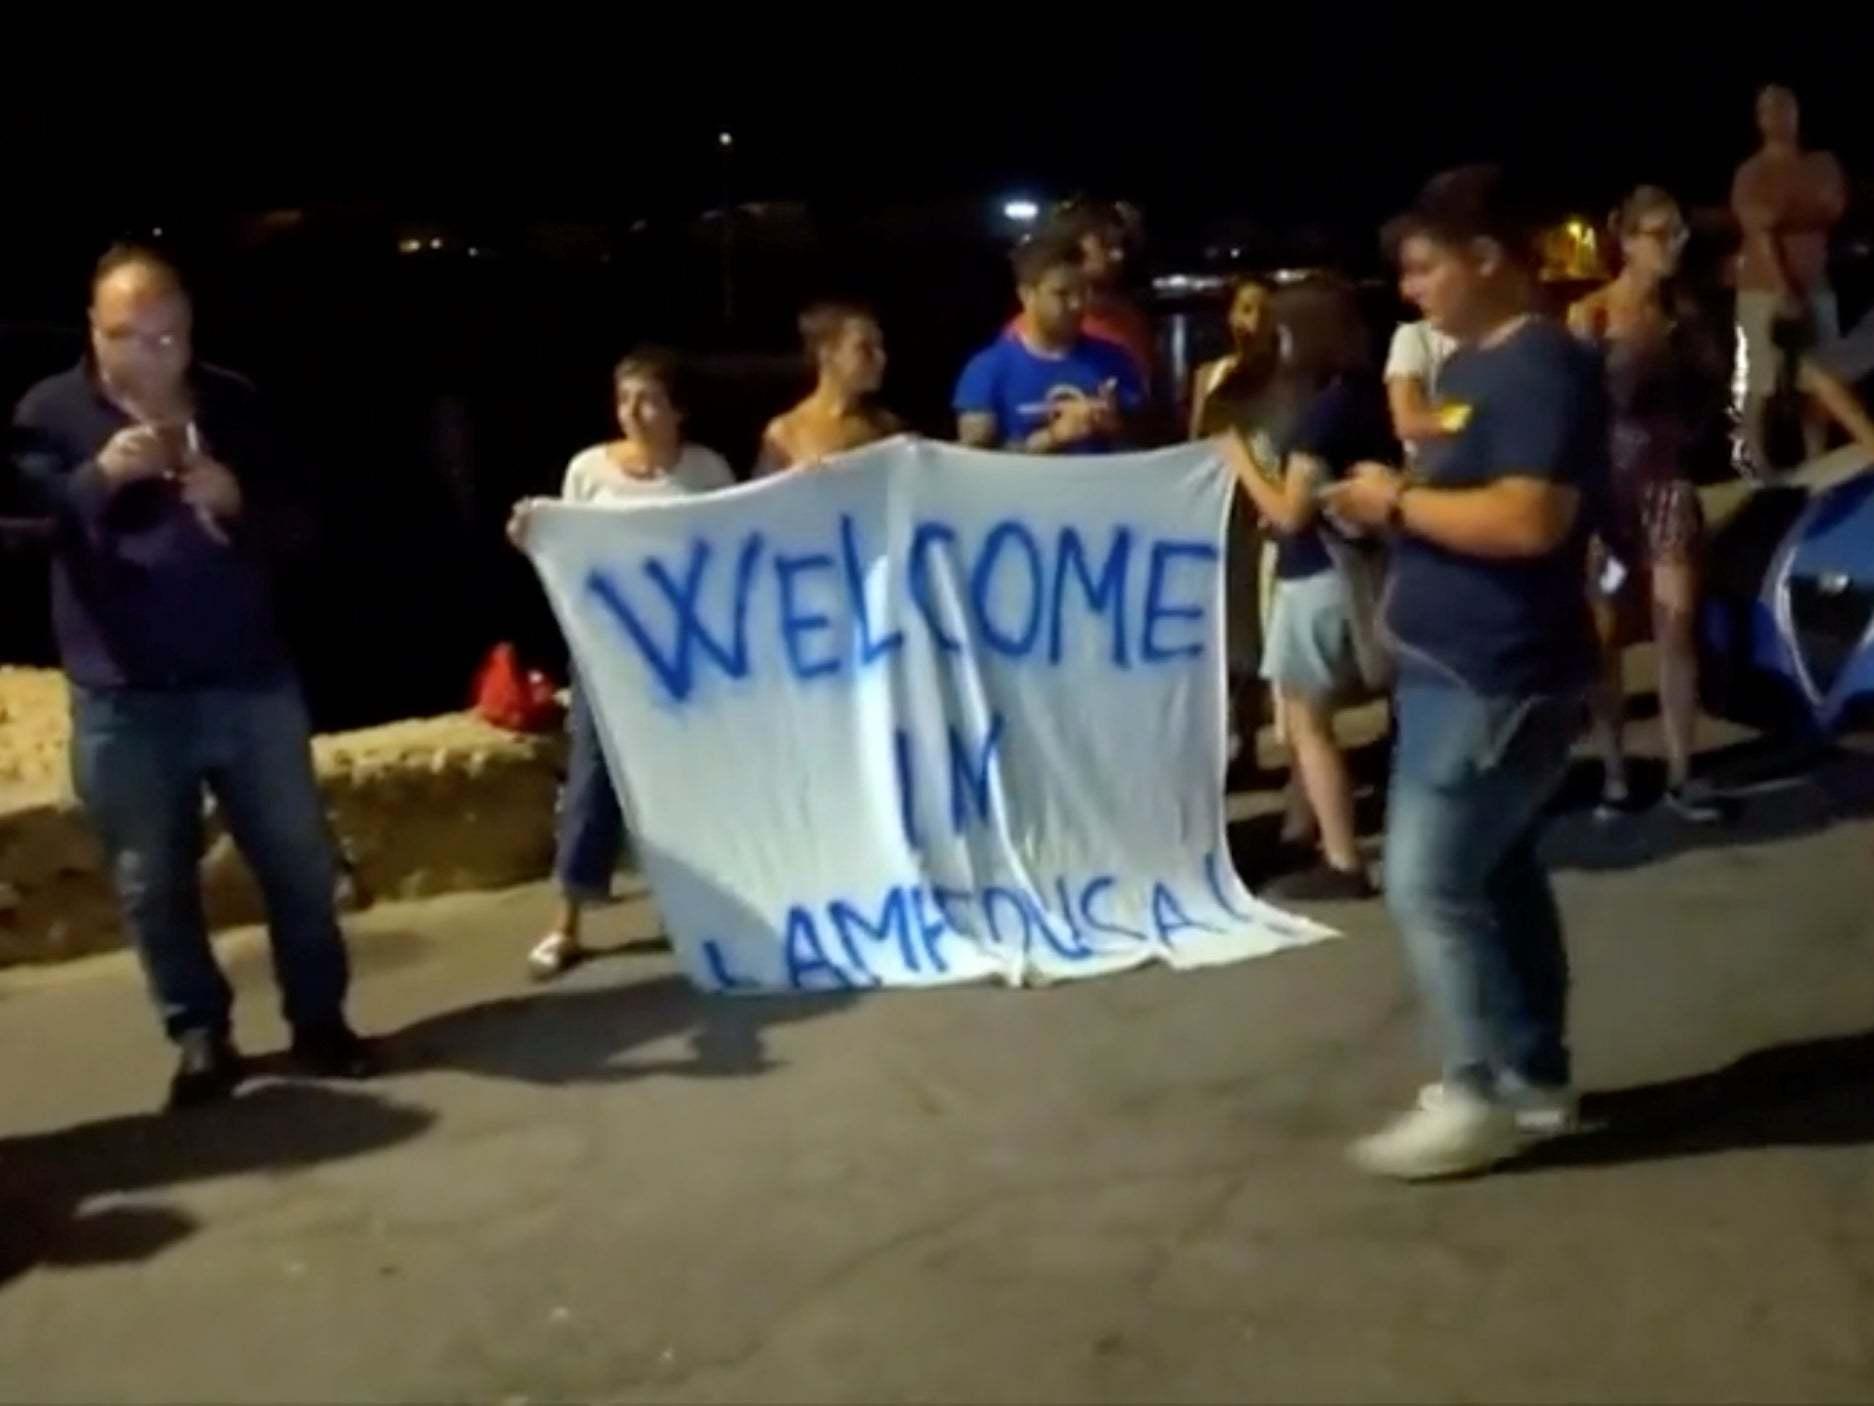 Matteo Salvini's relentless attacks on migrants make me sick – where's his compassion?